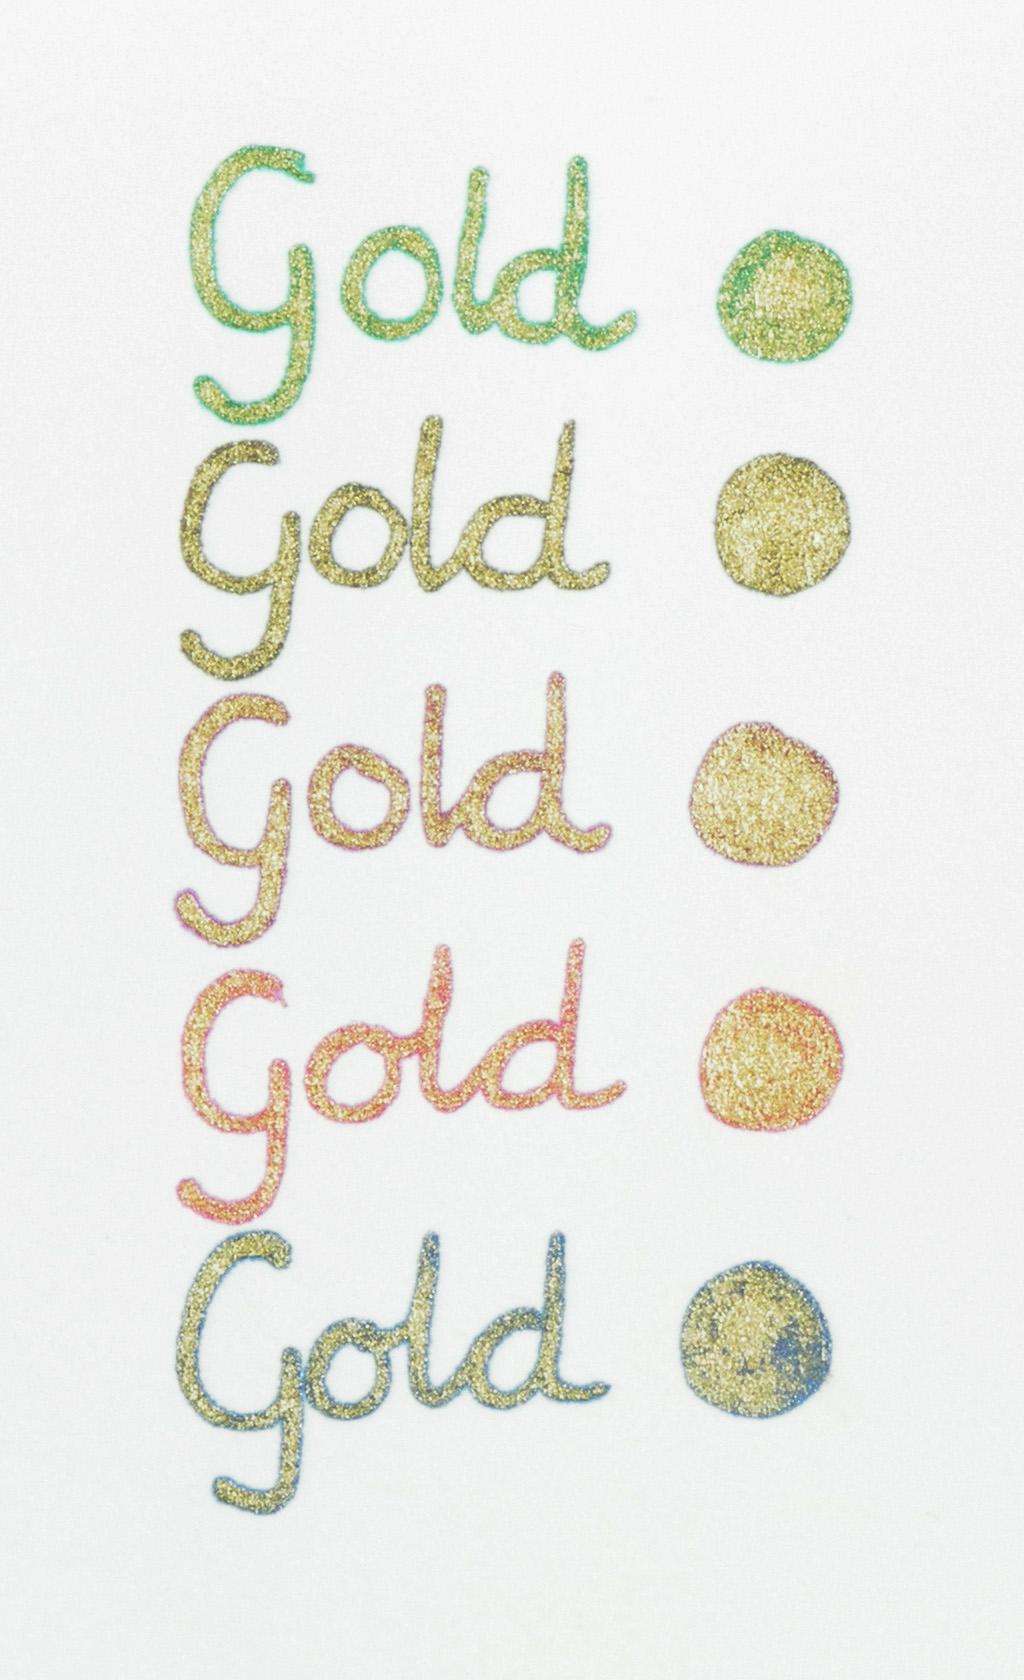 Gold Shadow  Close-up effect - A.jpg